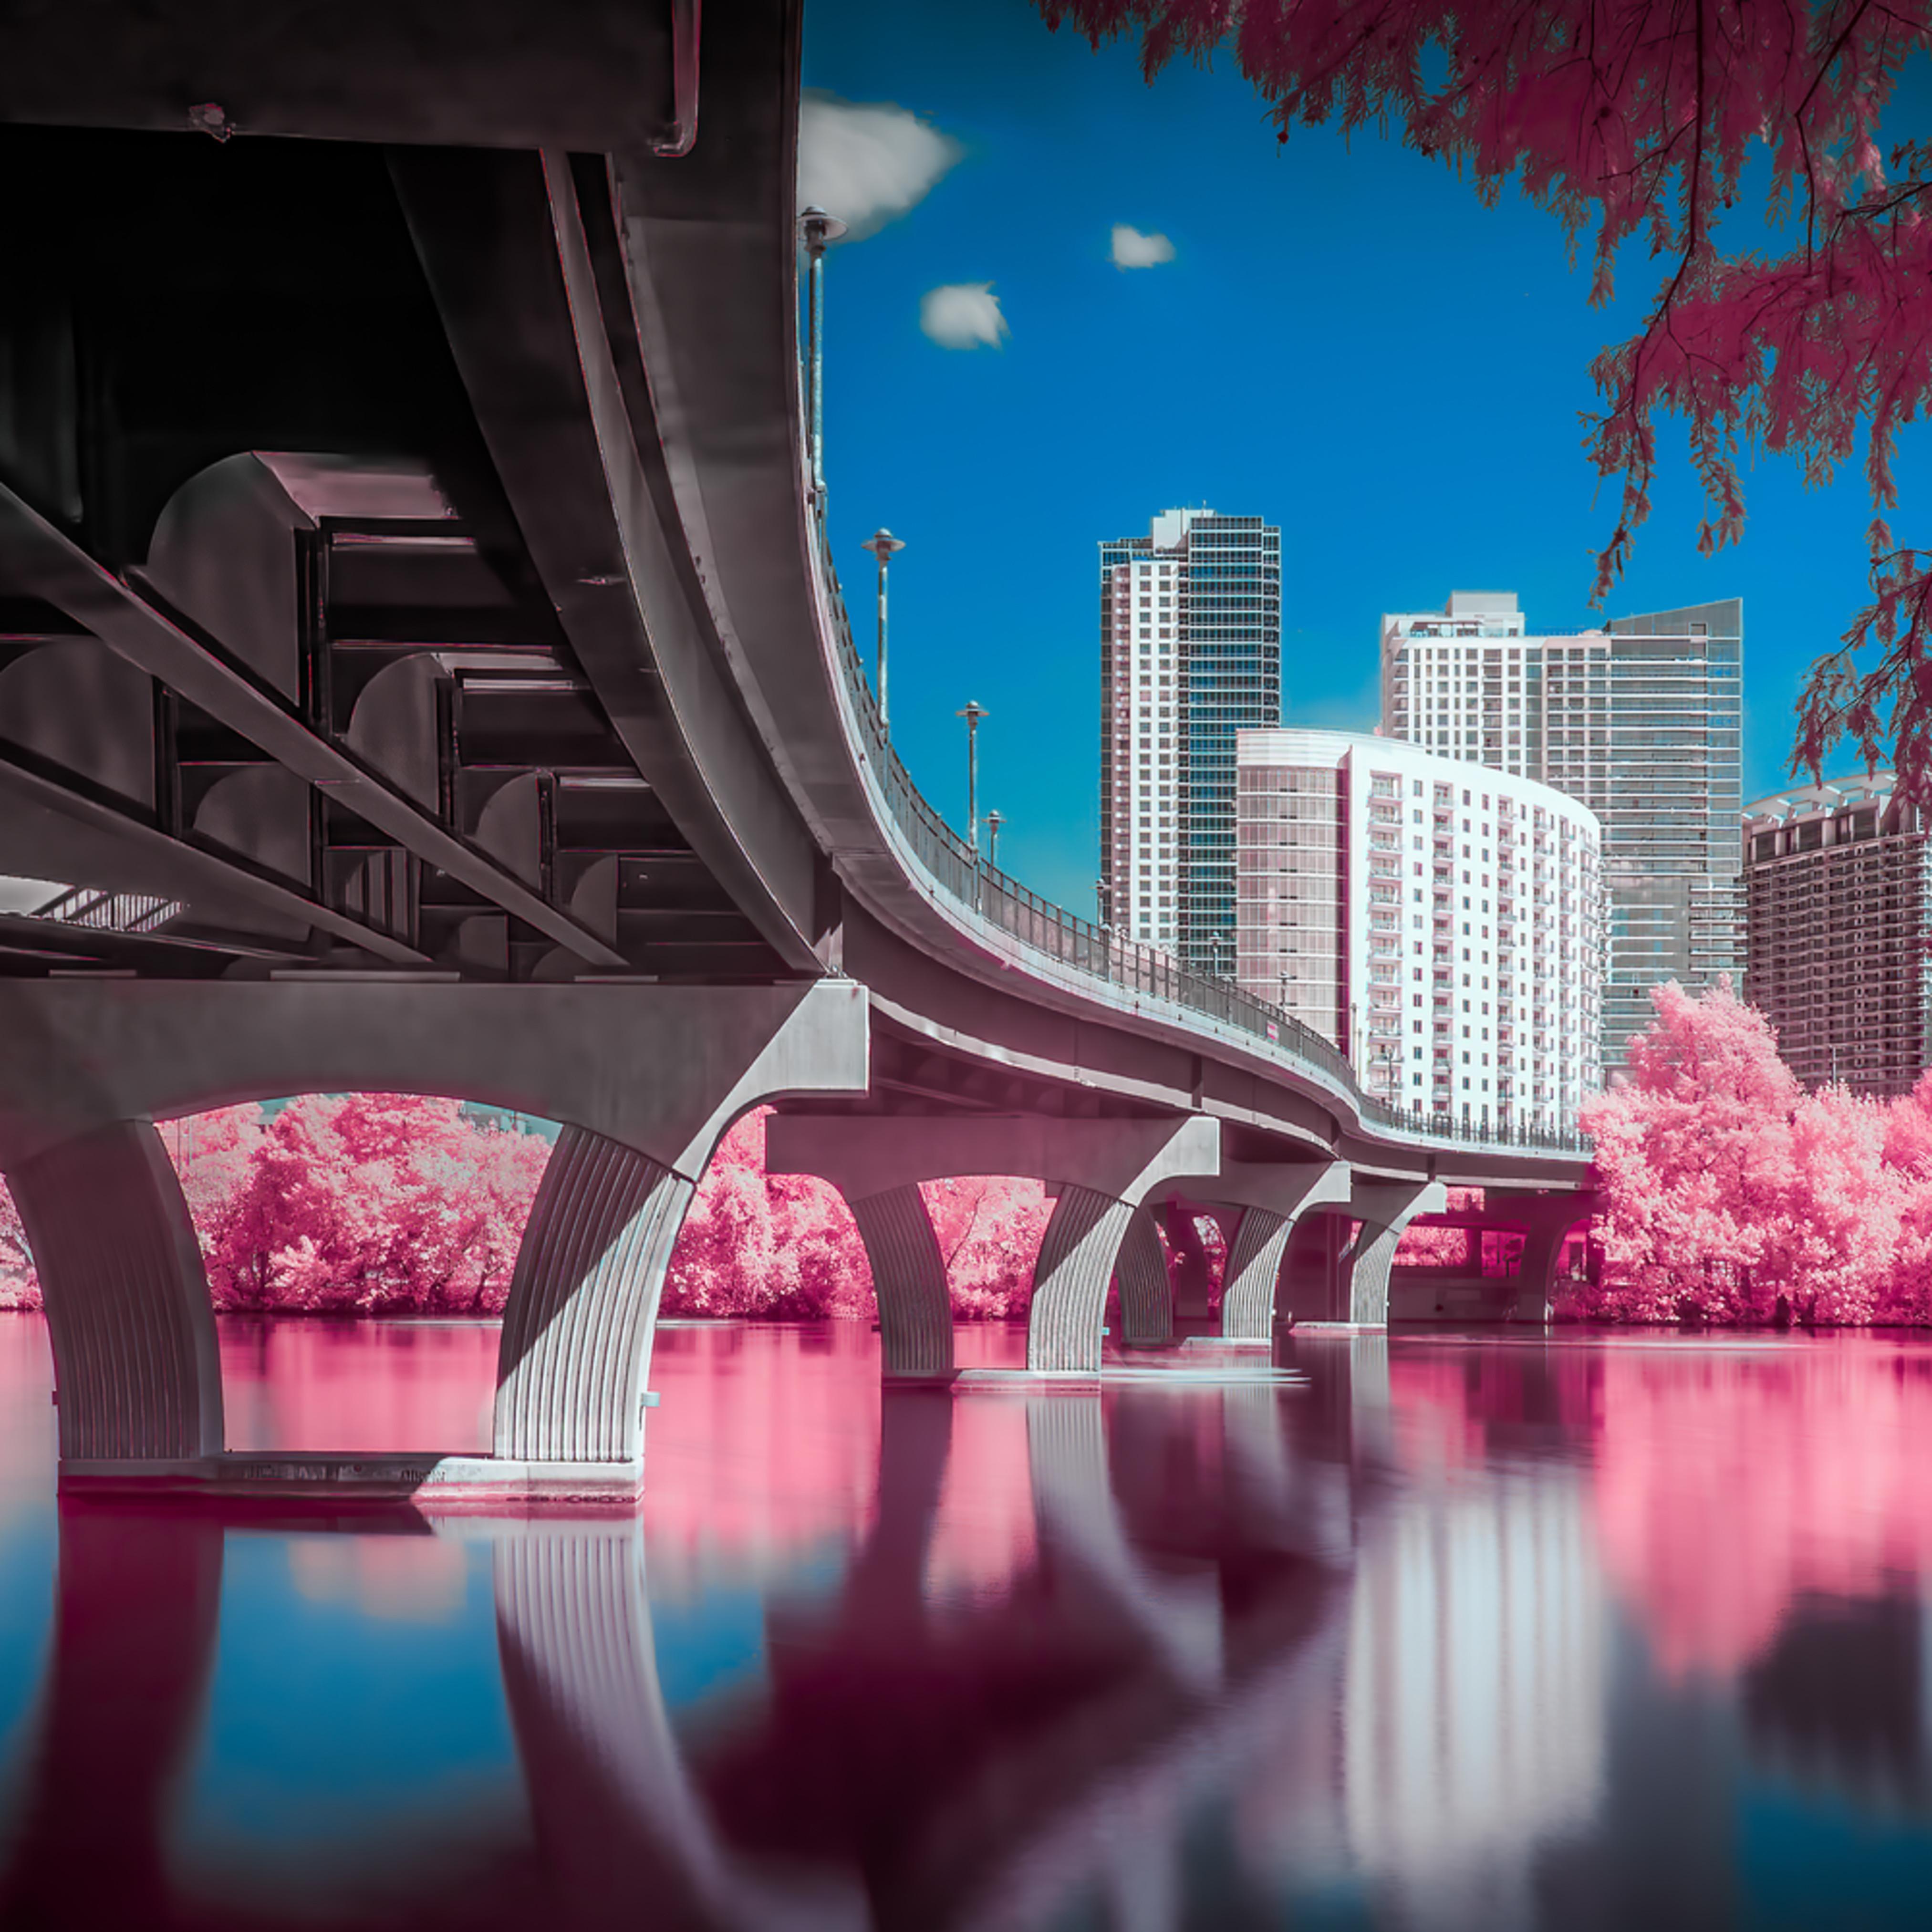 Crossing the river of dreams upsized zny26z